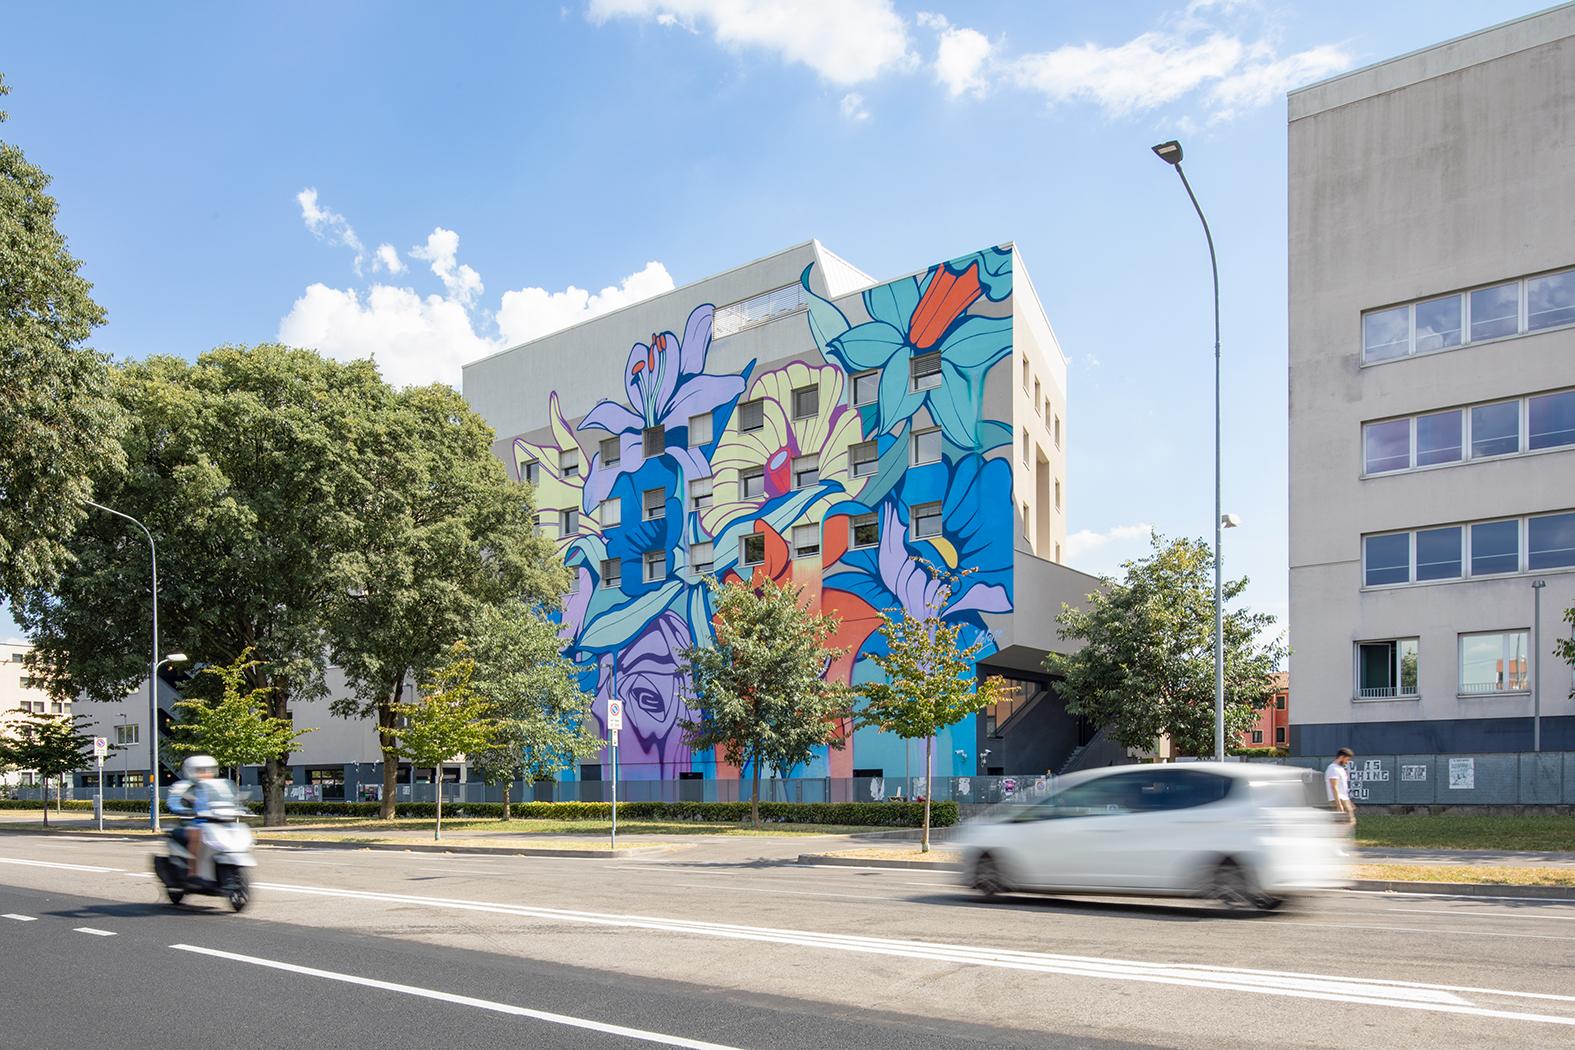 Nerone-superwalls-street-art-padova-14